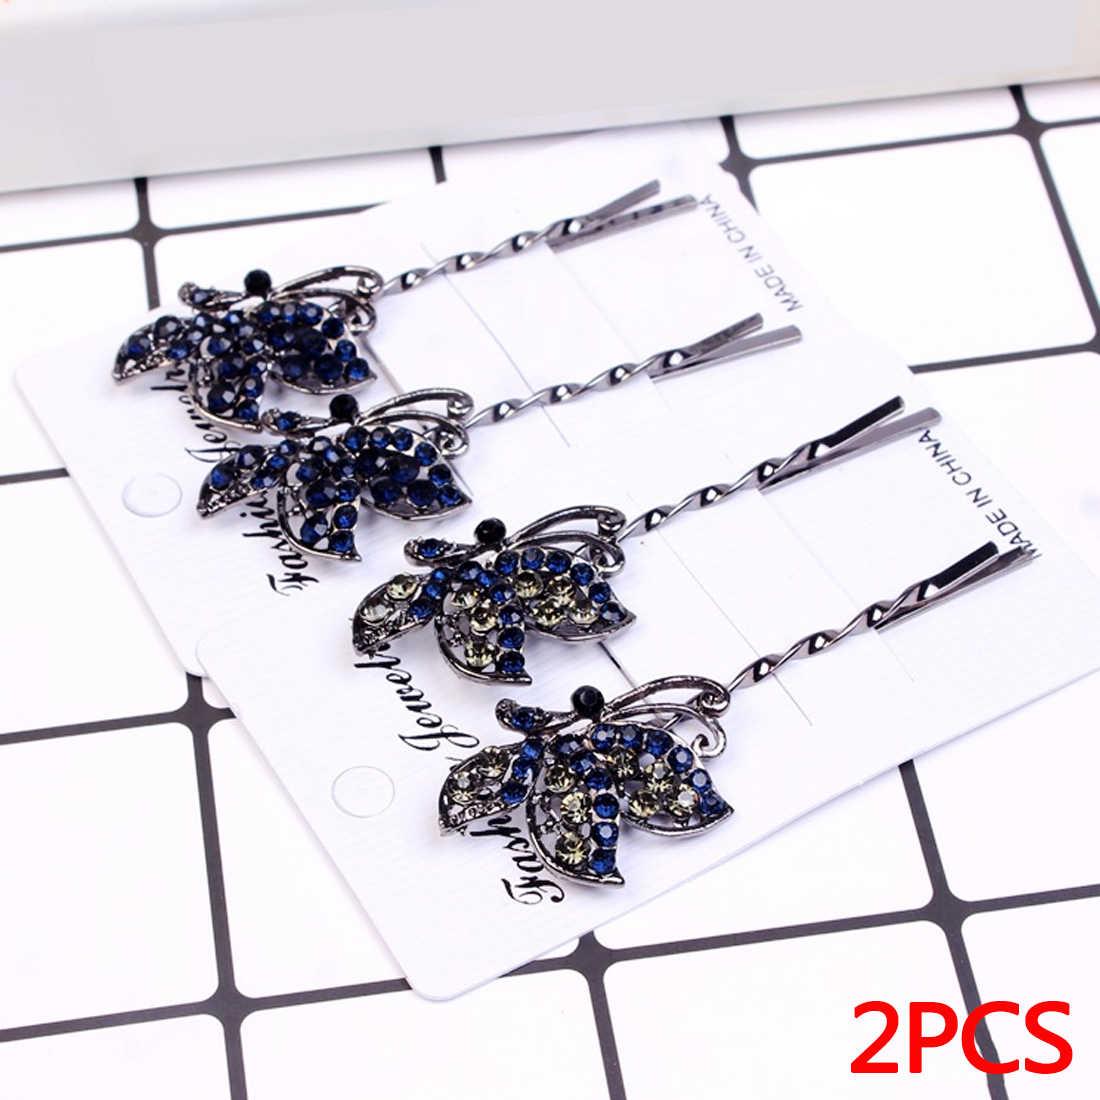 1 Pair Women Vintage Crystal Hair Clips Girls Flower Tiara Blue Rhinestone Hair Pin Bridal Wedding Hair Accessories Jewelry